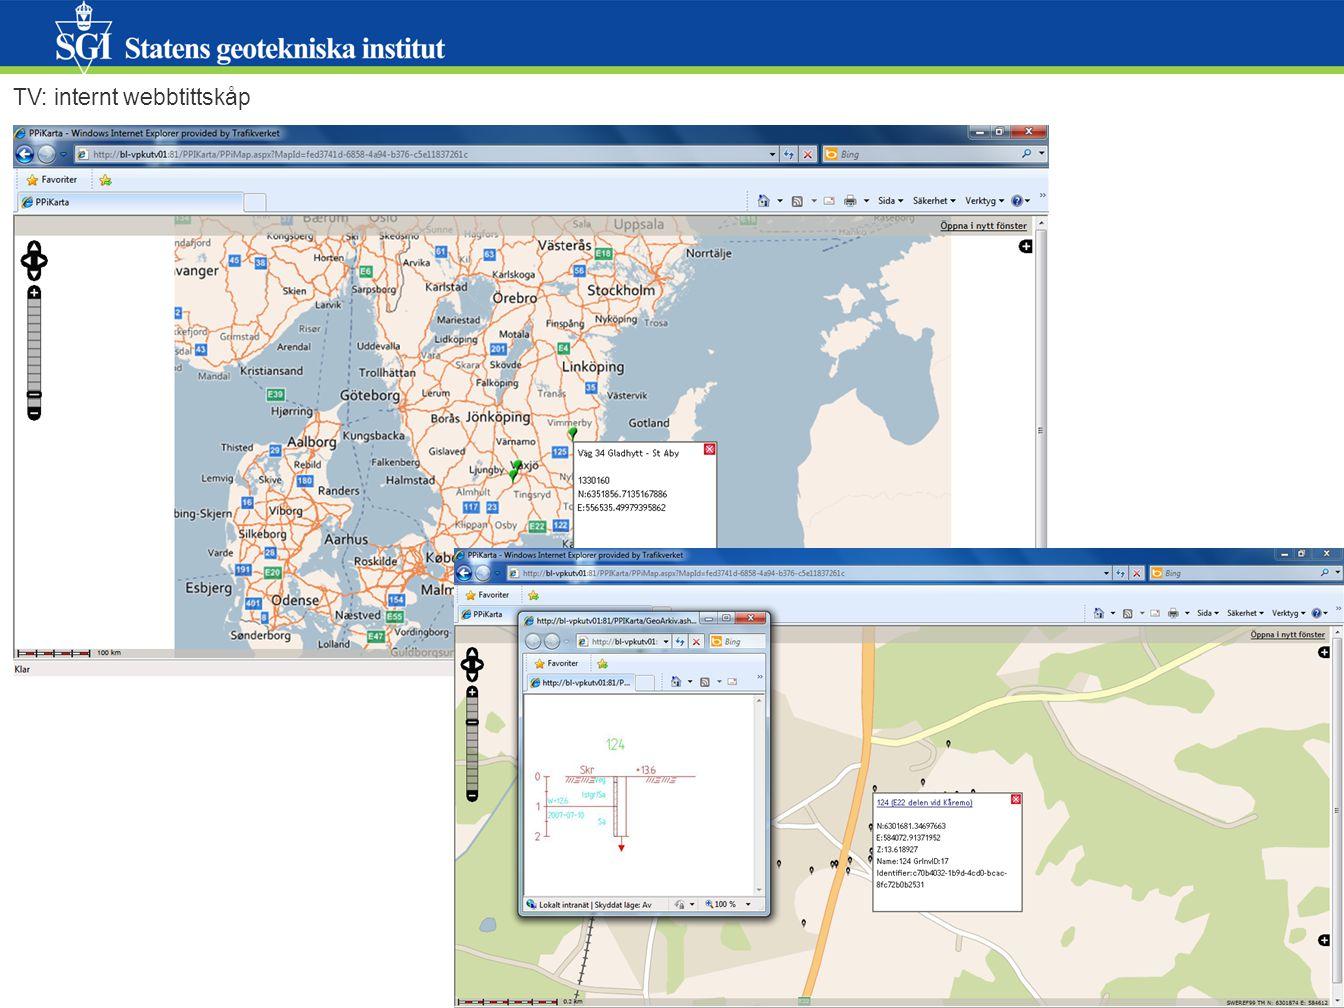 mats.oberg@swedgeo.se/2011-08-17 TV: internt webbtittskåp